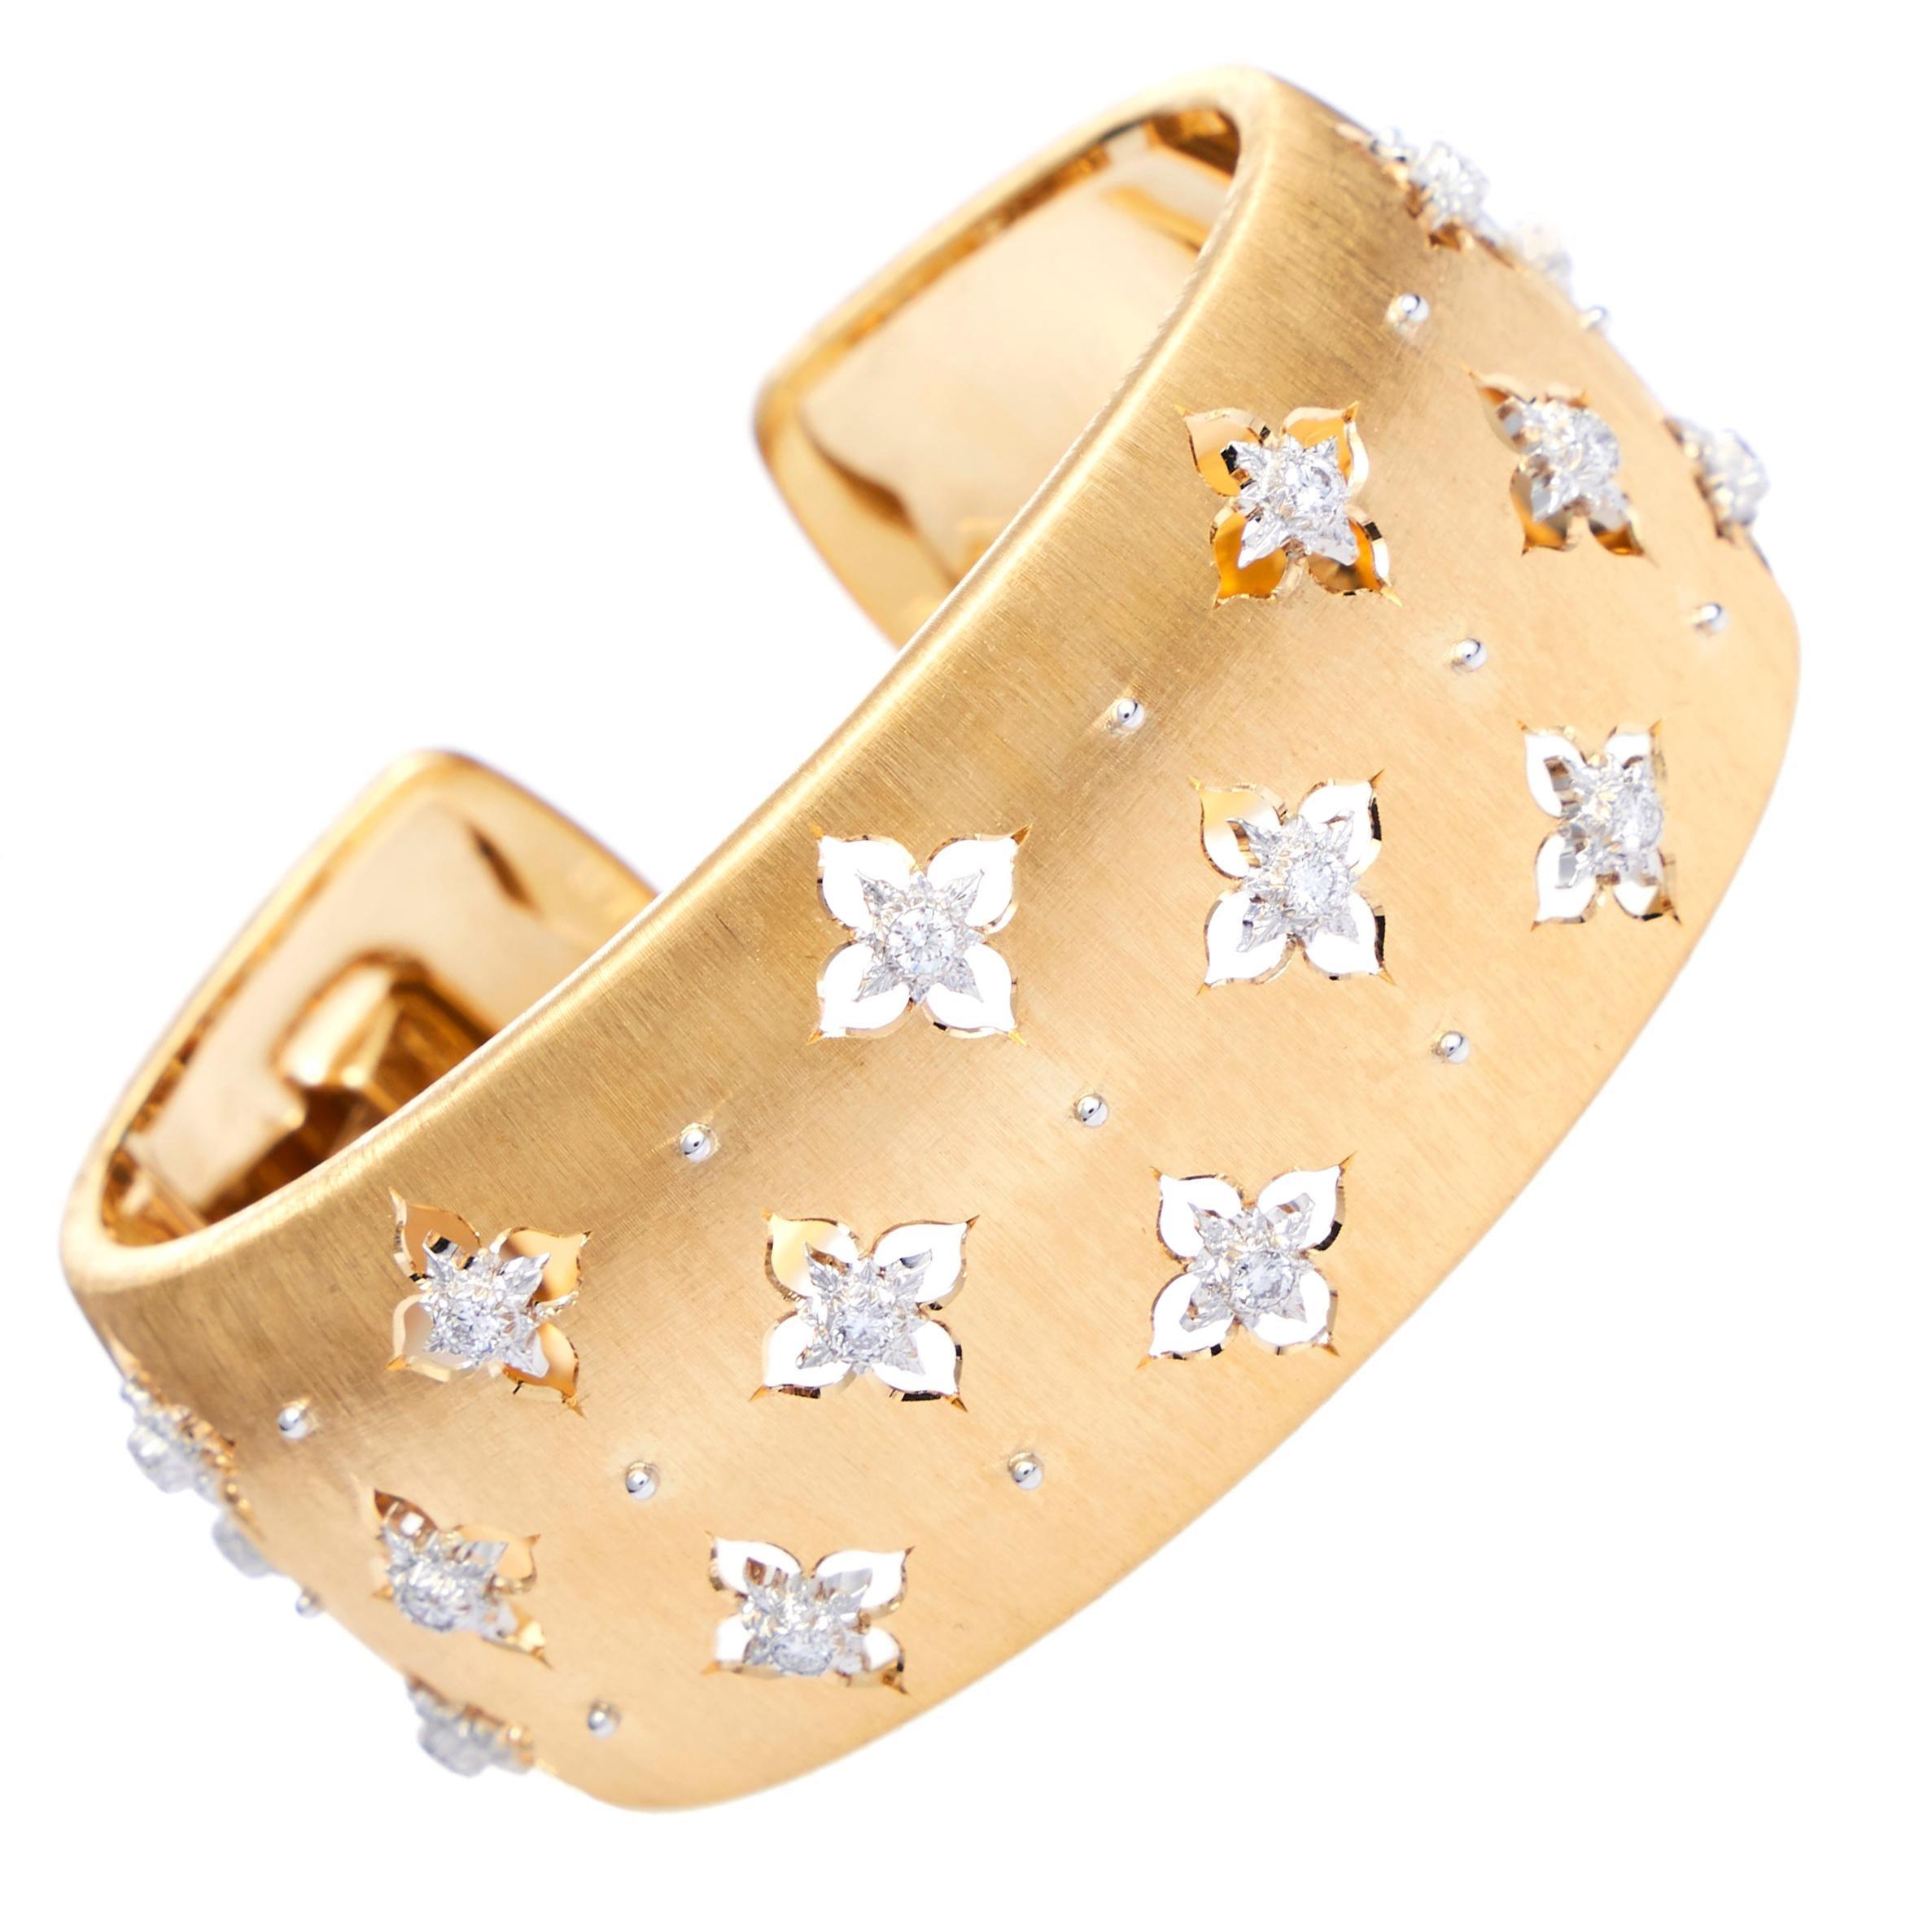 Buccellati Yellow Gold Macri Cuff Bracelet Wide with Diamonds